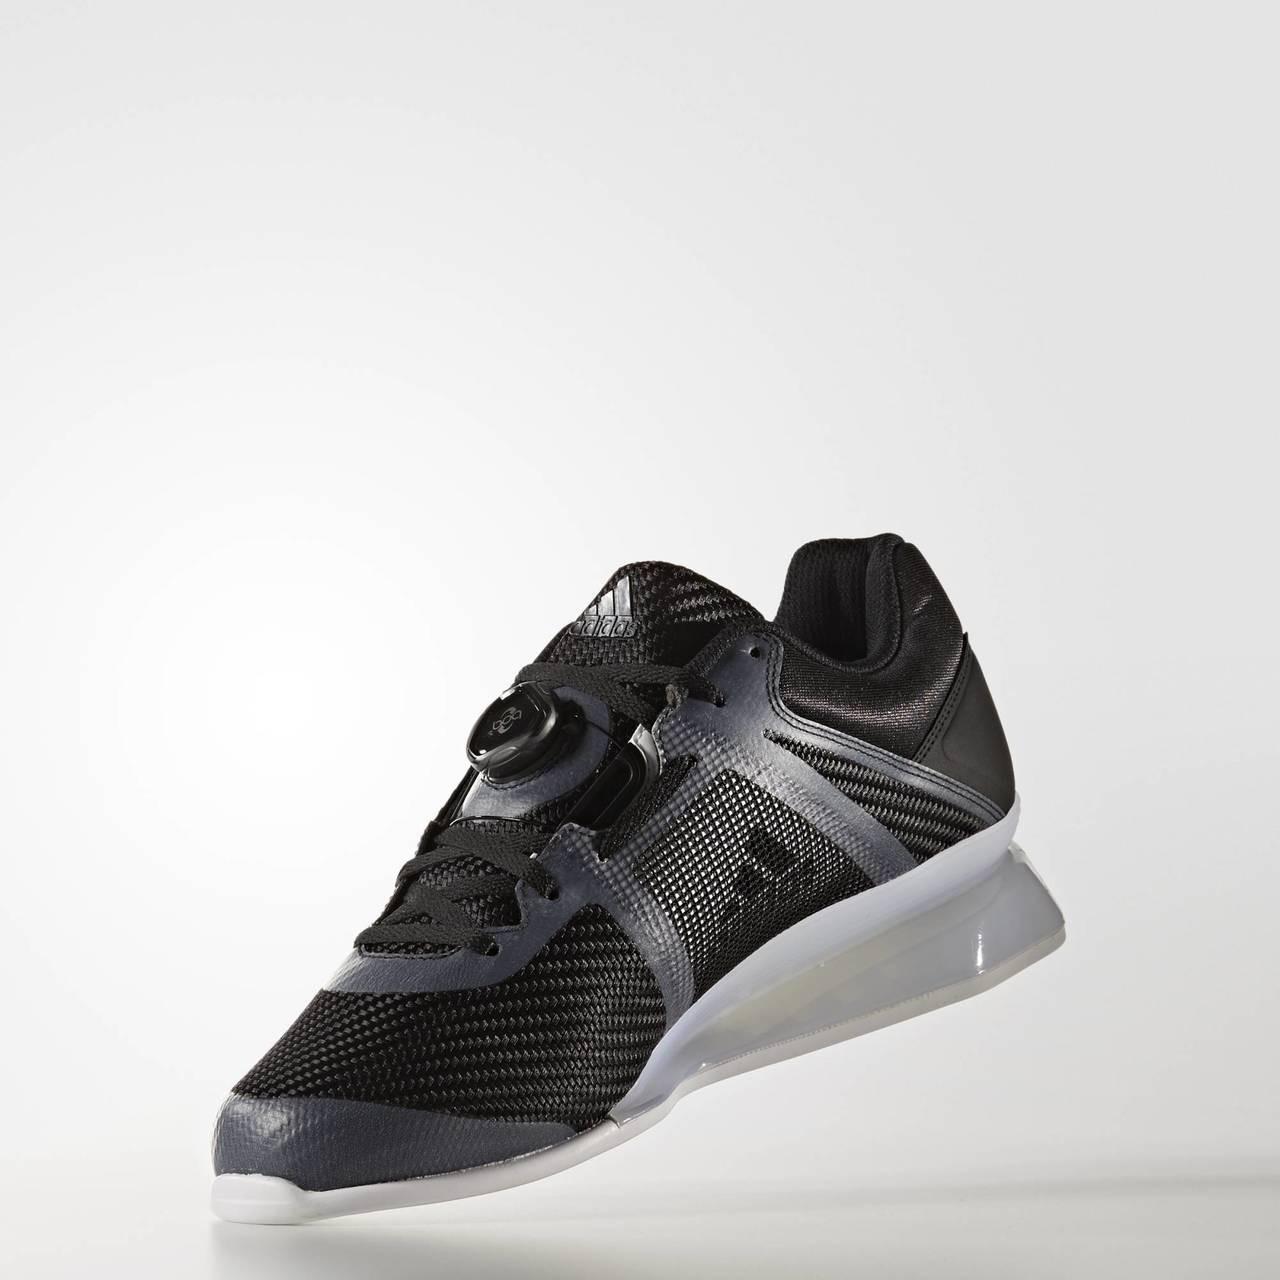 Black Men's adidas Leistung 16 ll Weightlifting Shoes